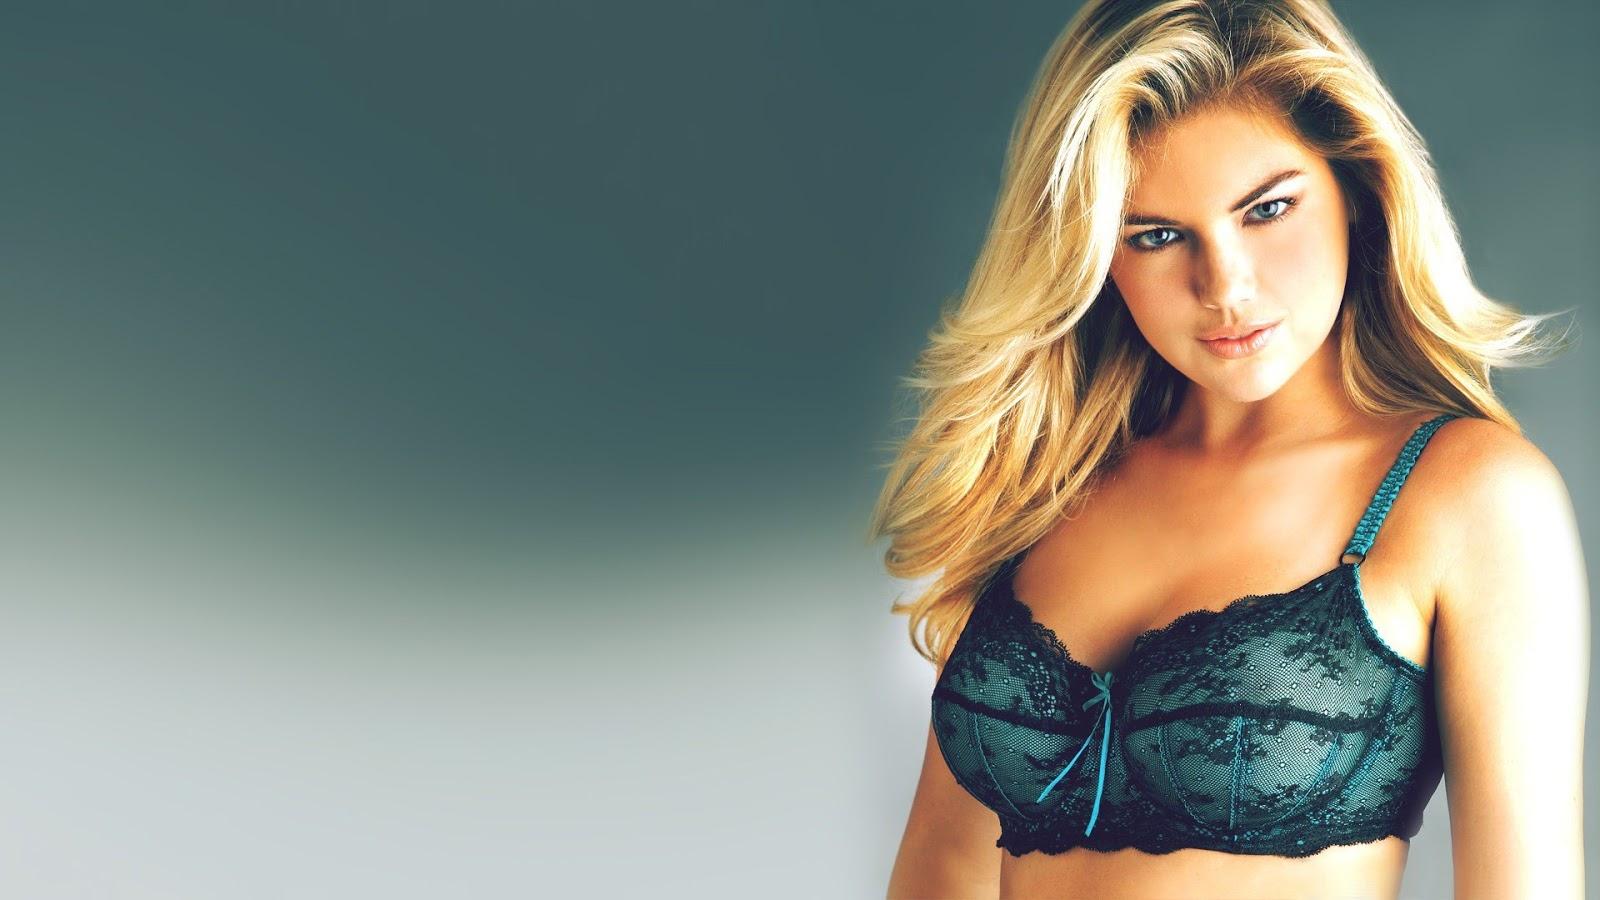 Hot HD Wallpaper of Beautiful Kate Upton